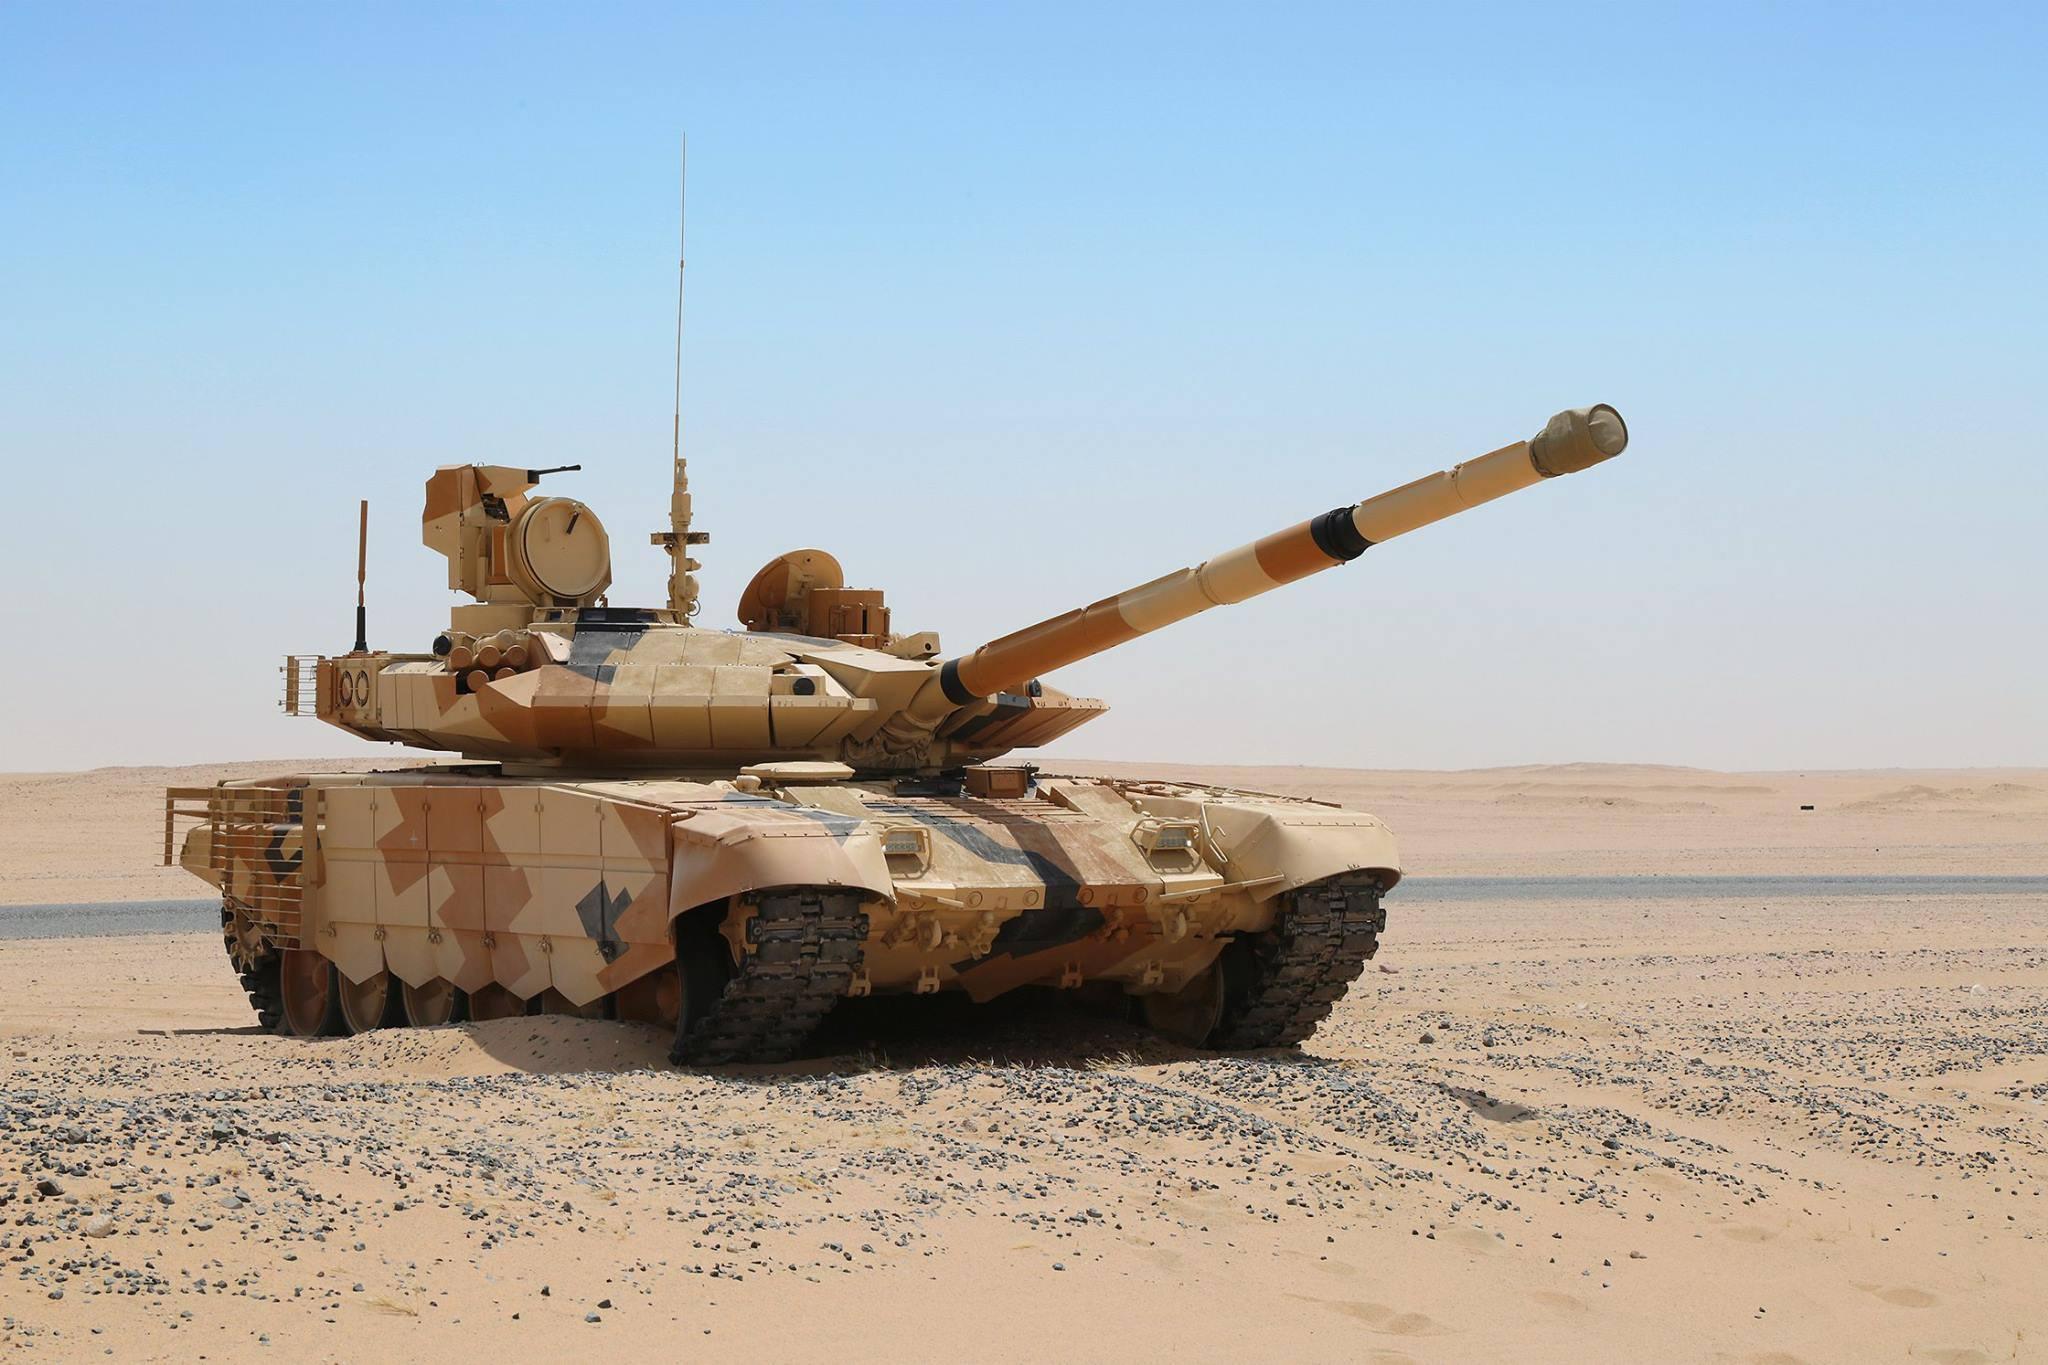 IDEX 2017- Uralvagonzavod  conquista um importante contrato para os carros de combate T-90MS no Oriente Médio